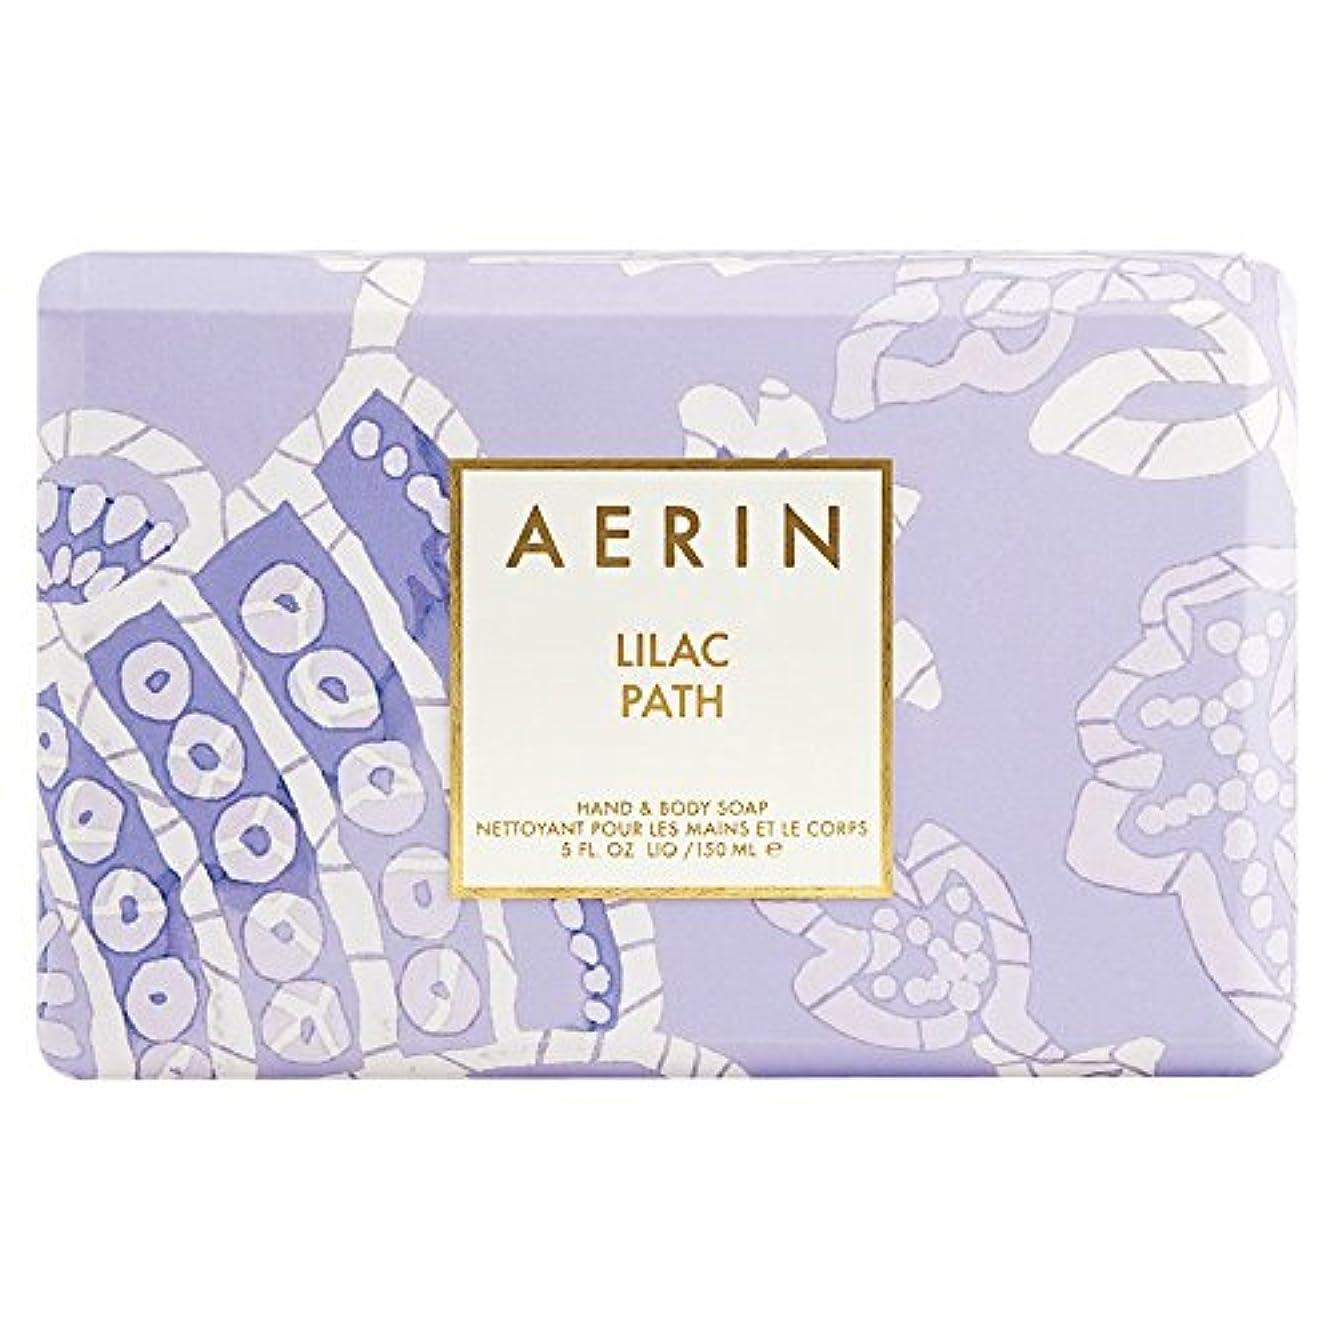 Aerinライラックパス石鹸176グラム (AERIN) - AERIN Lilac Path Soap 176g [並行輸入品]